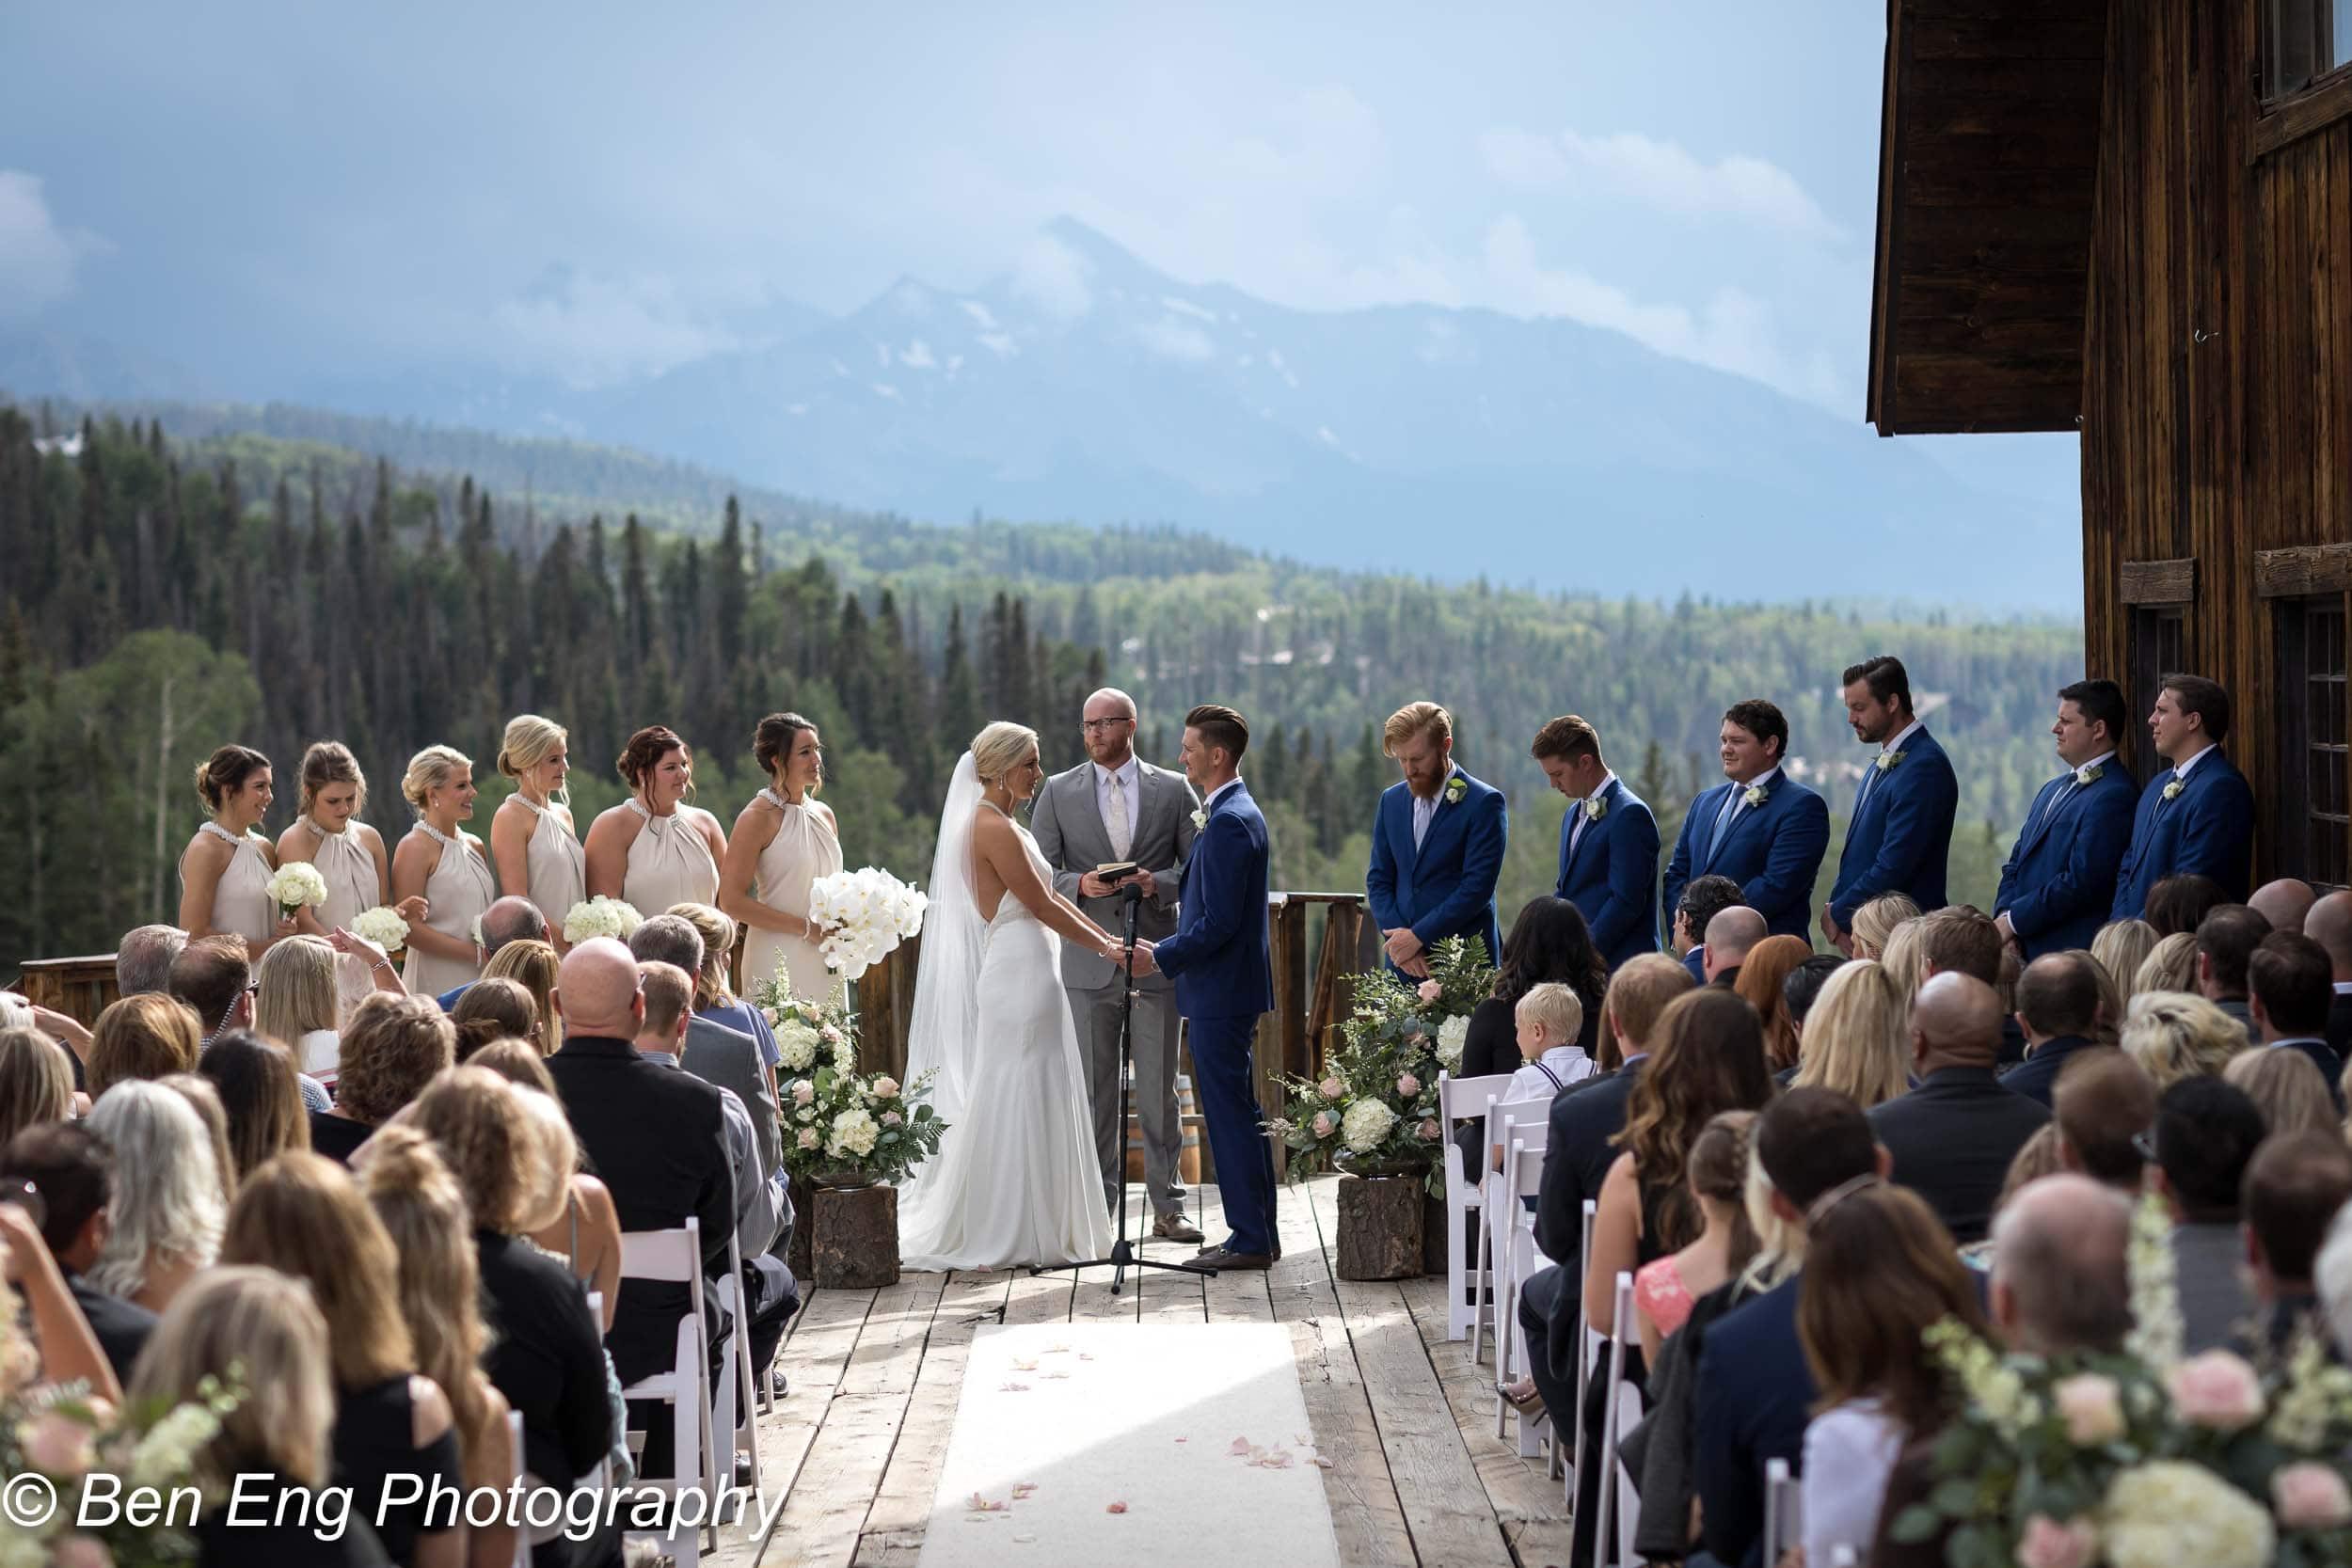 Rustic destination wedding at Gorrono Ranch in the mountains of Telluride, Colorado.